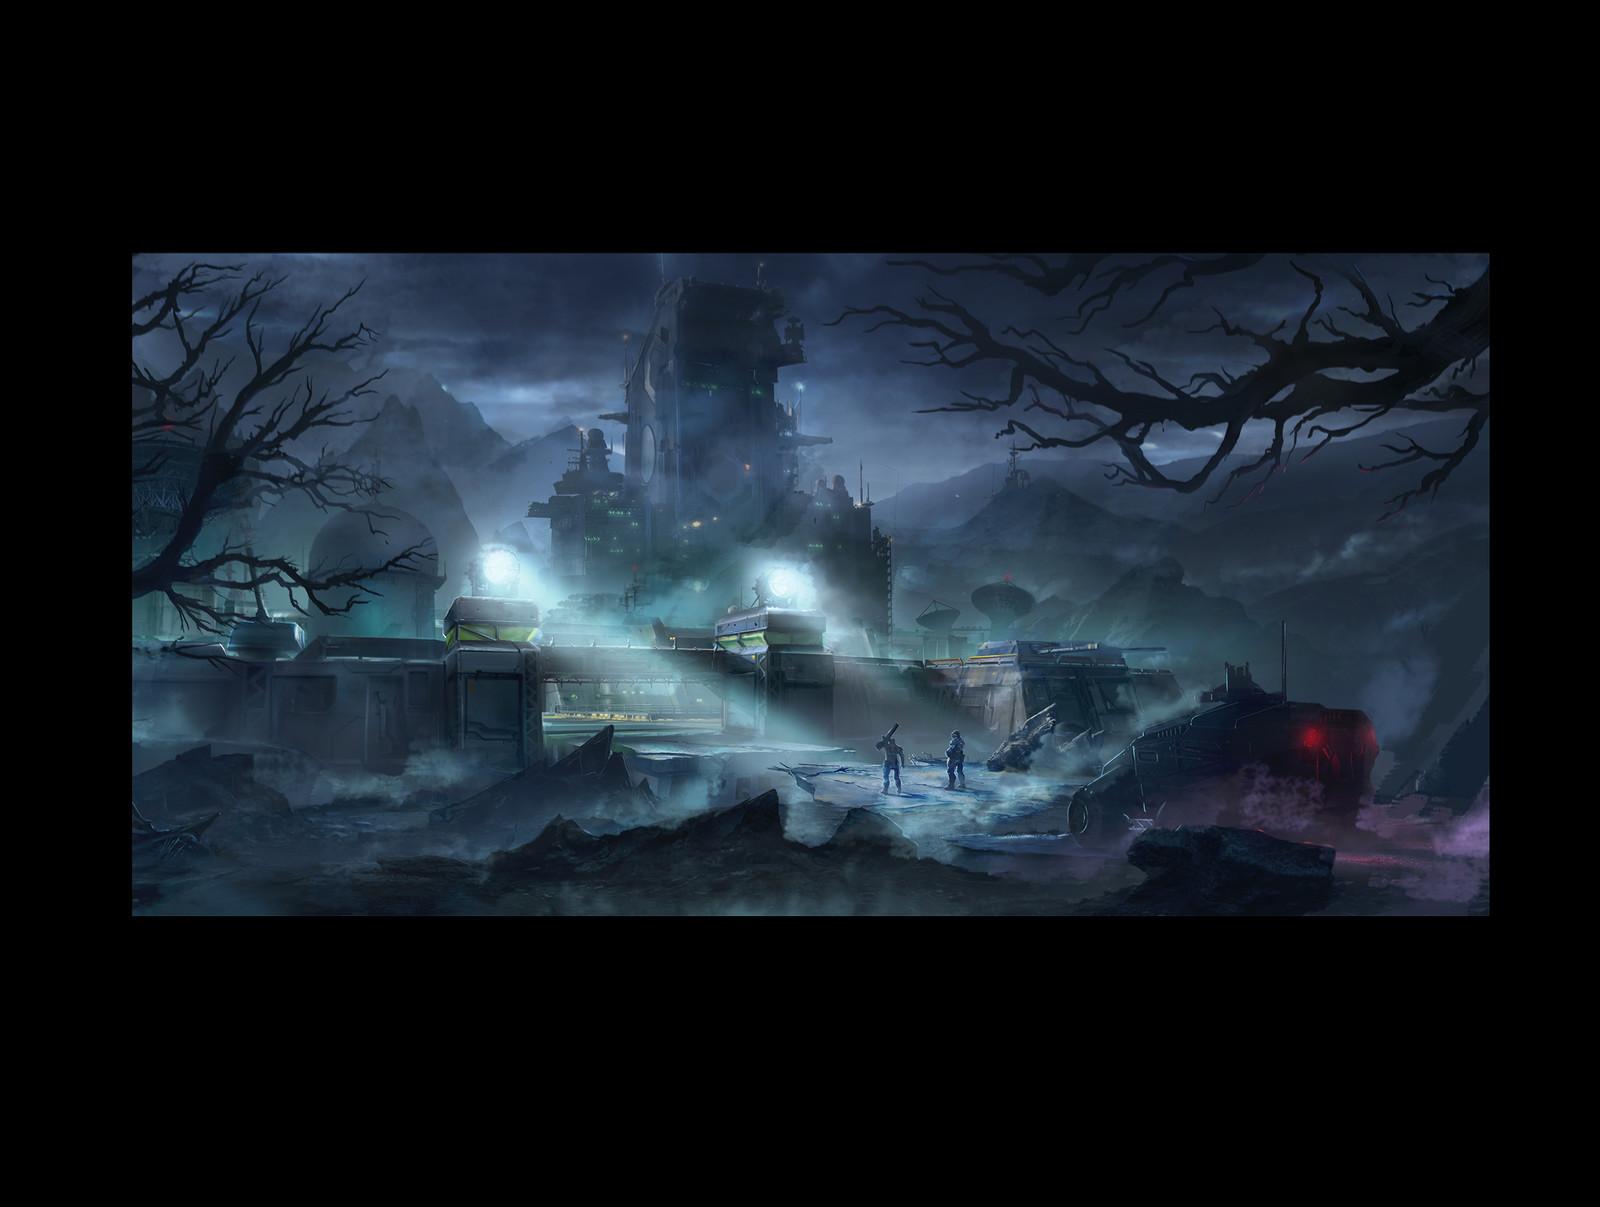 Phoenix Point ,Concept art (game demo level)